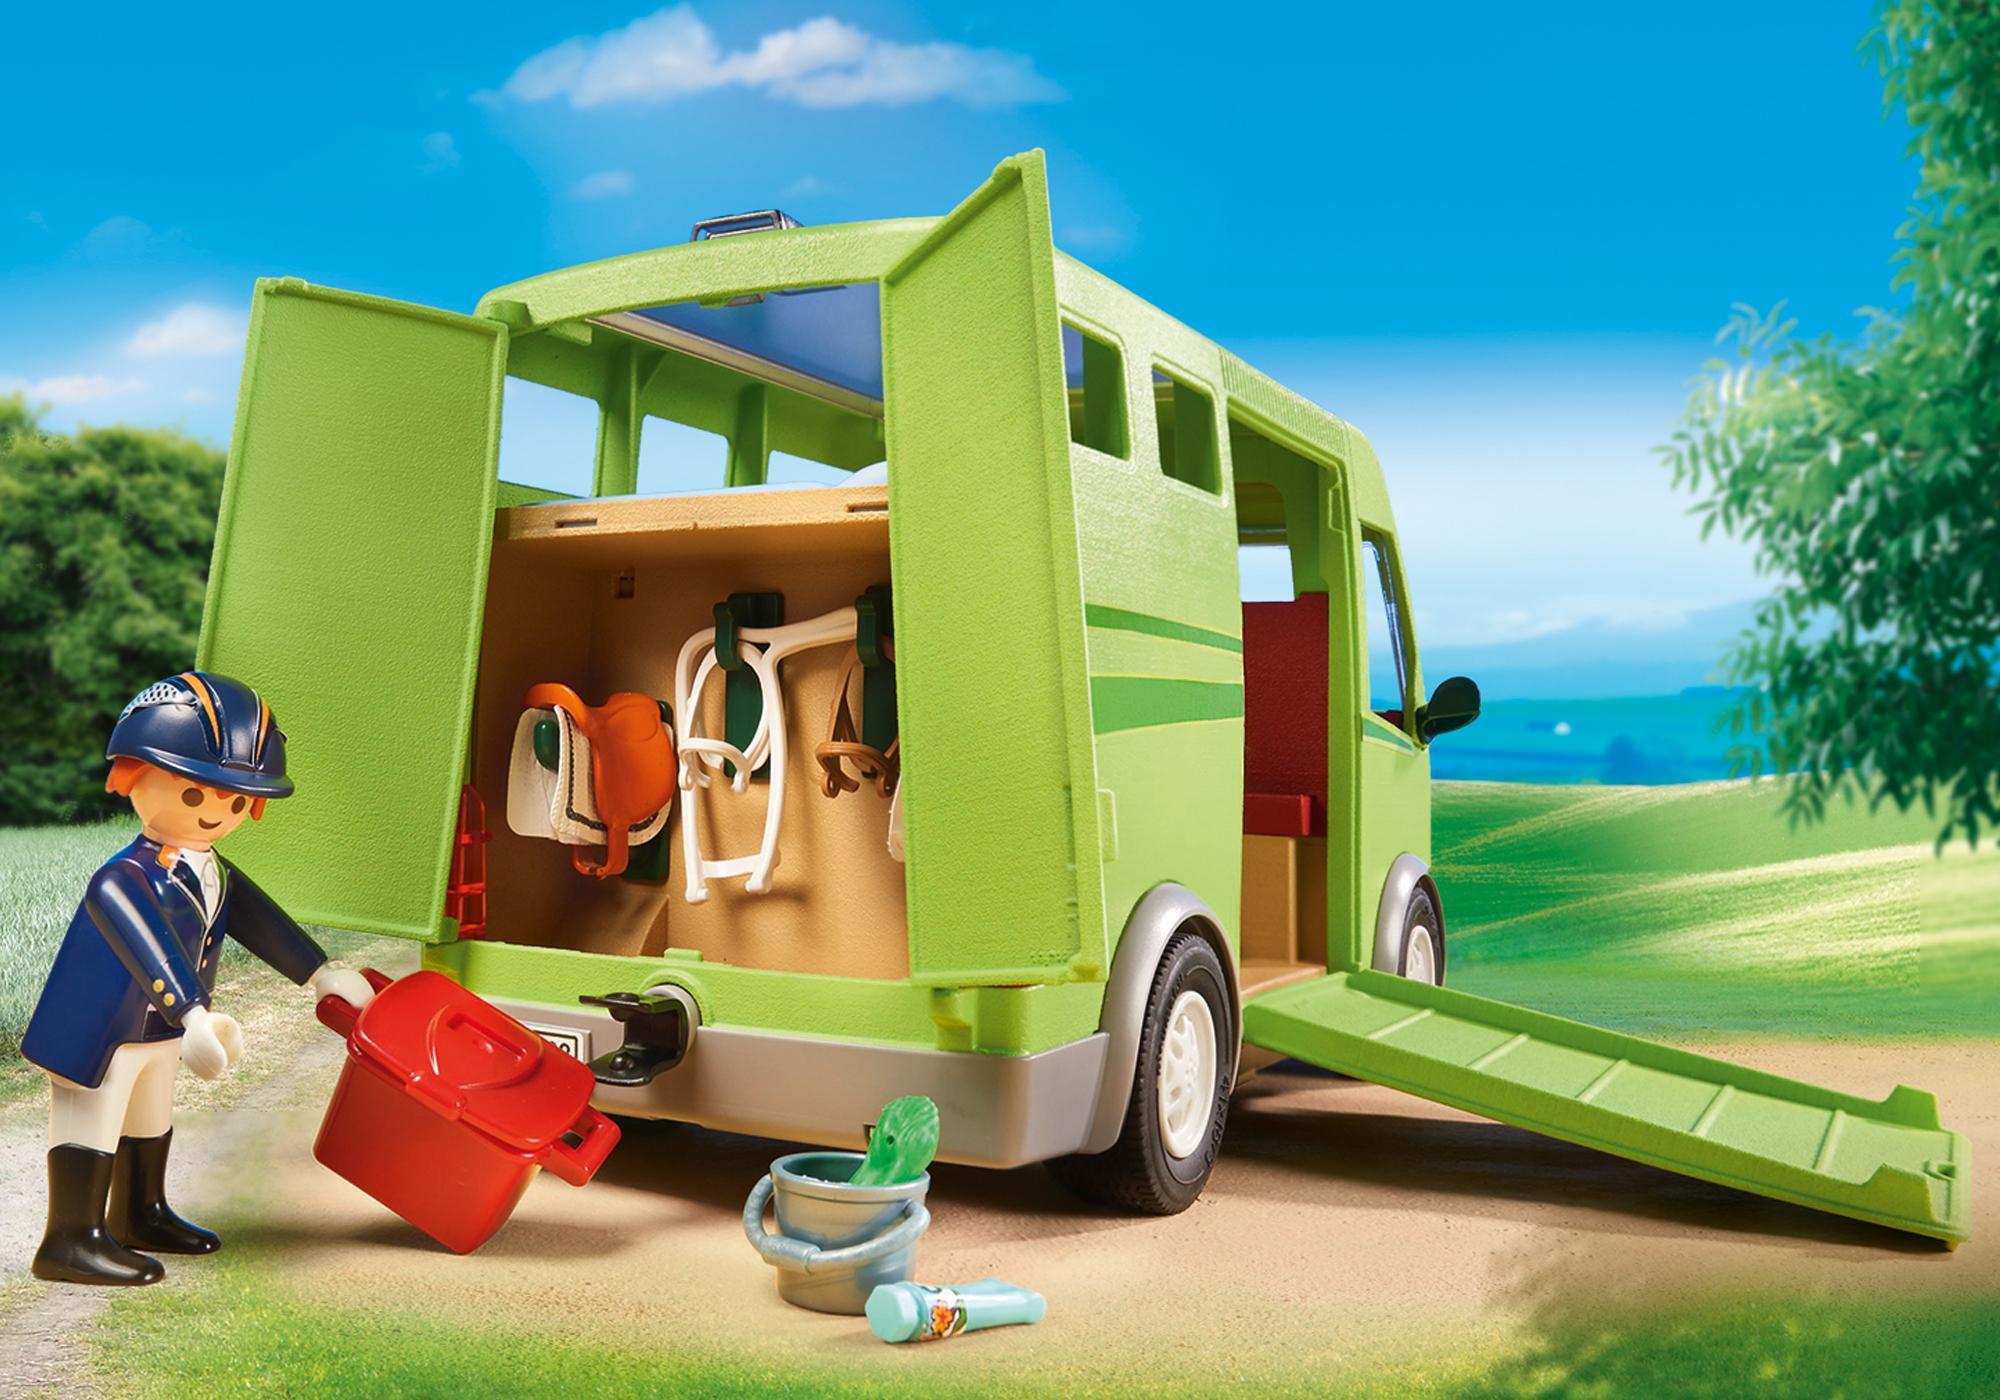 http://media.playmobil.com/i/playmobil/6928_product_extra2/Cavalier avec van et cheval